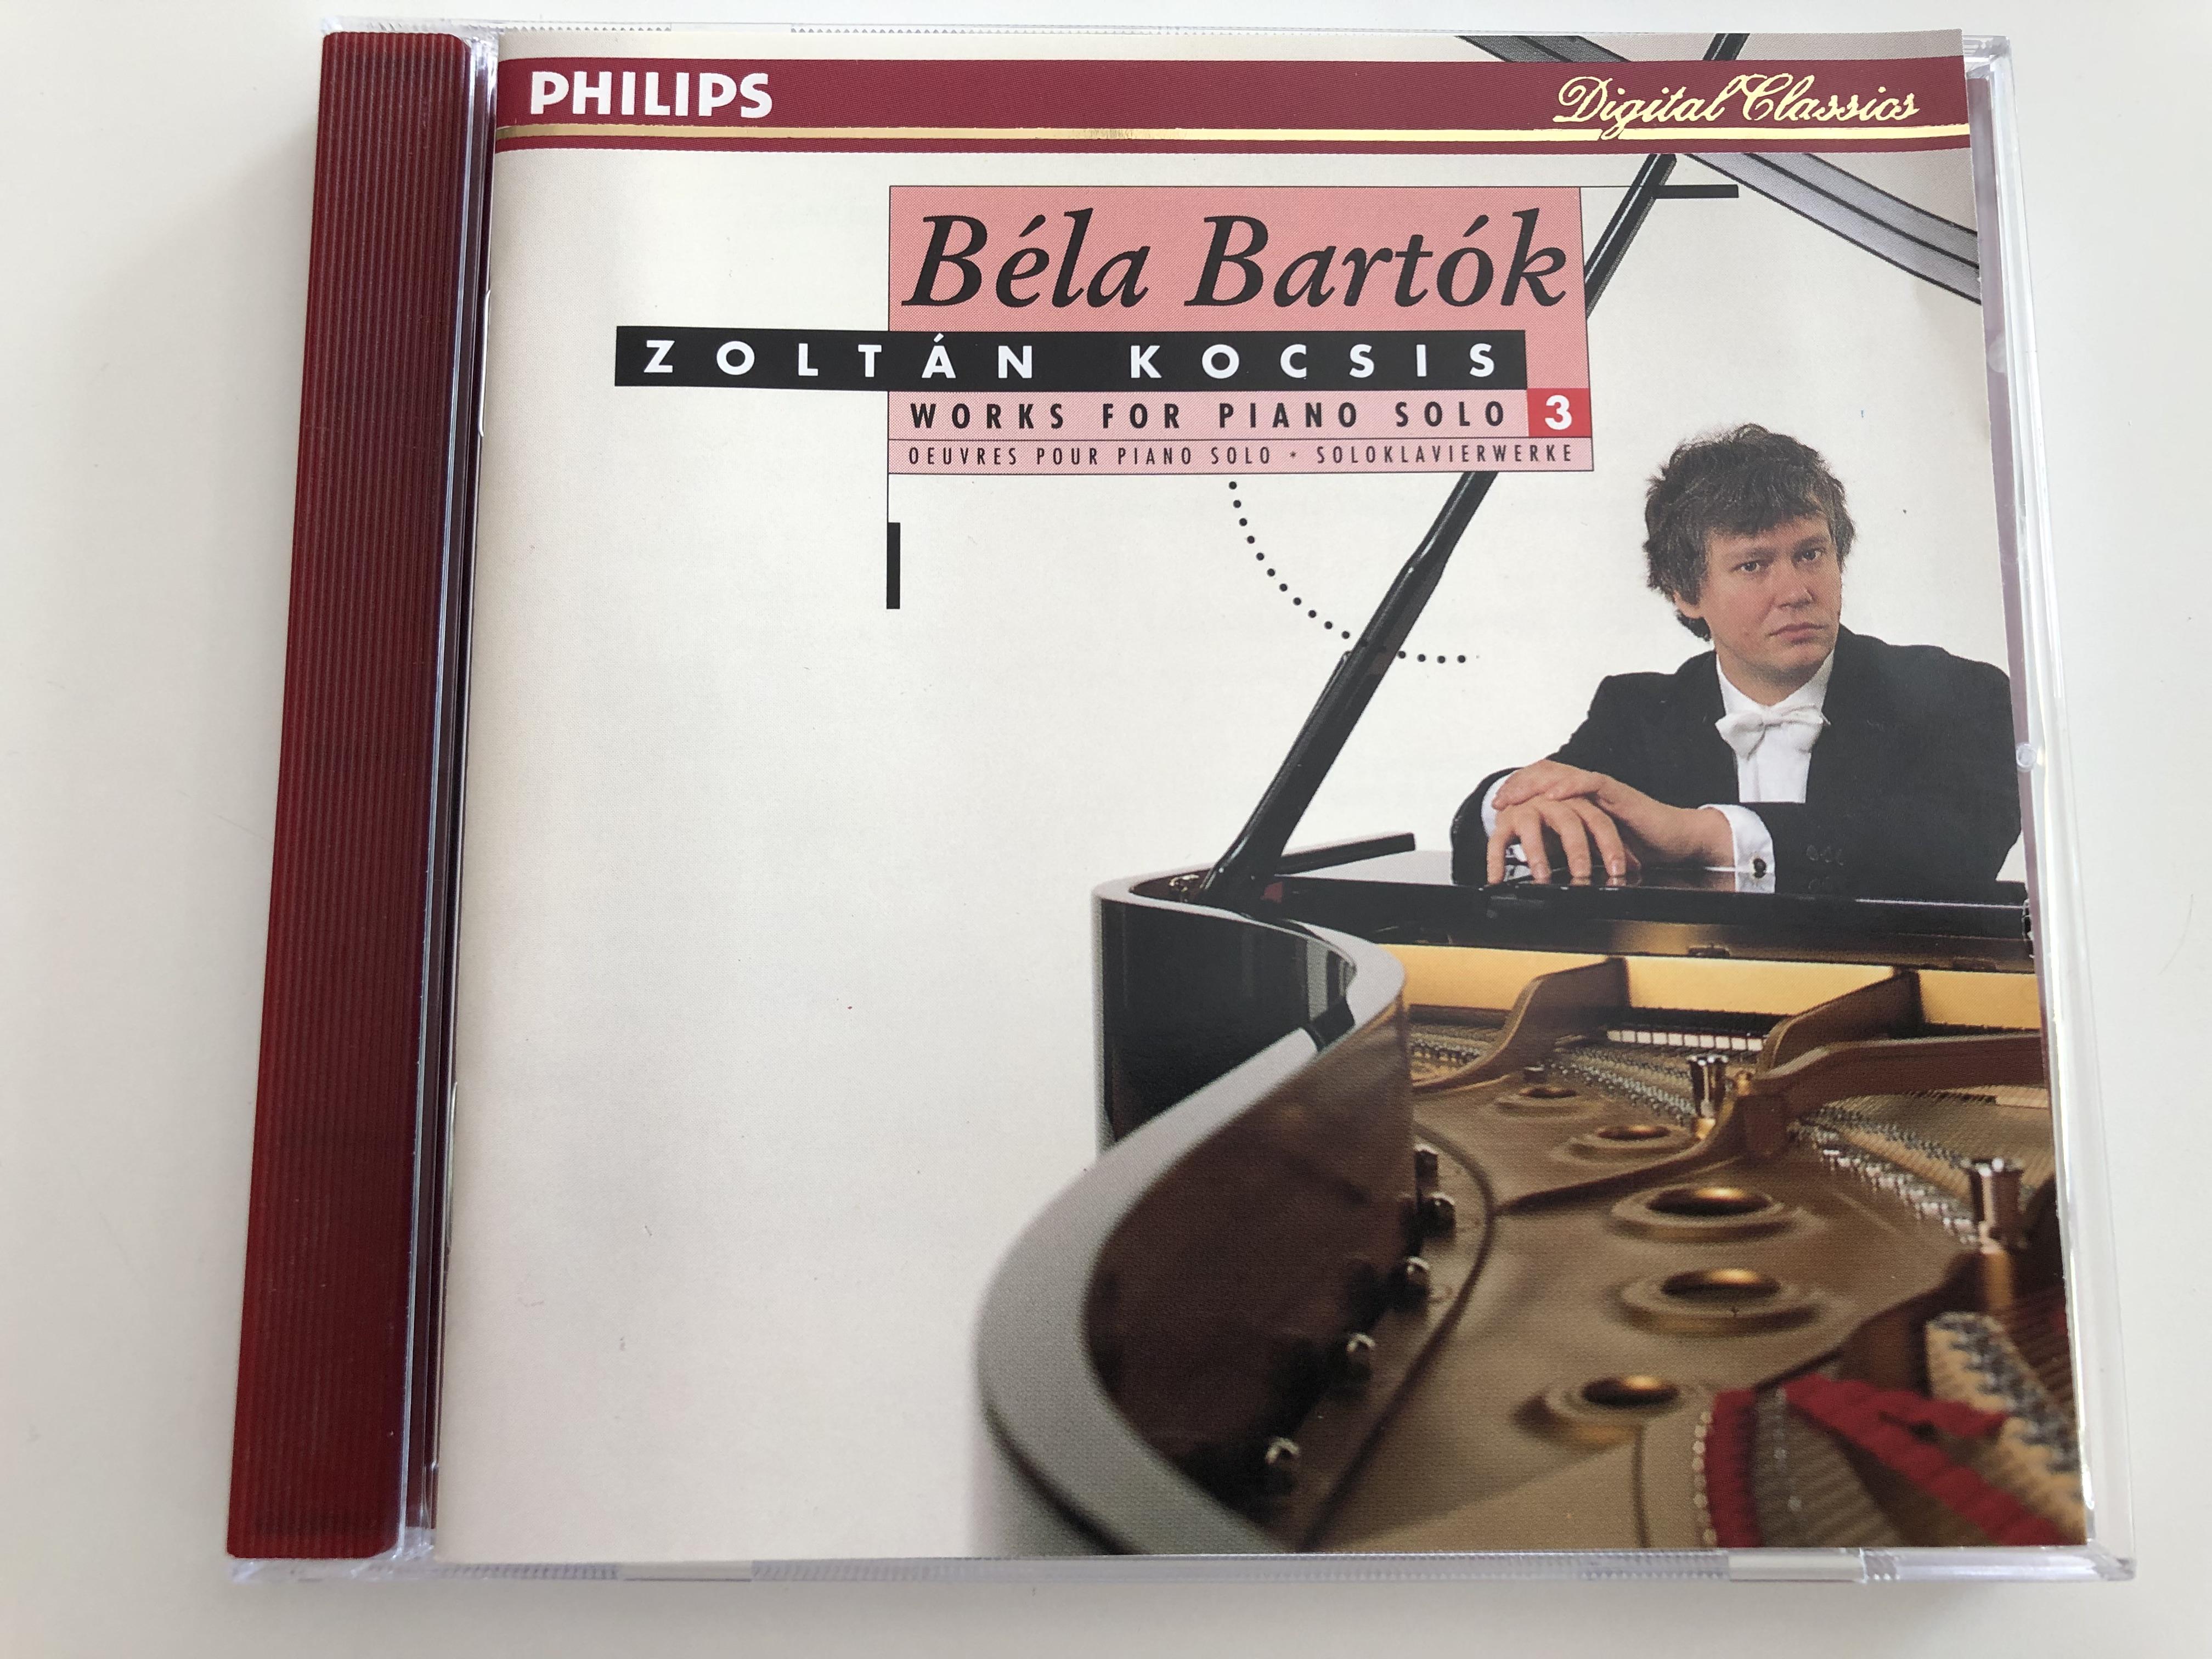 b-la-bart-k-works-for-piano-solo-3-zolt-n-kocsis-piano-philips-digital-classics-audio-cd-1995-442-146-2-1-.jpg